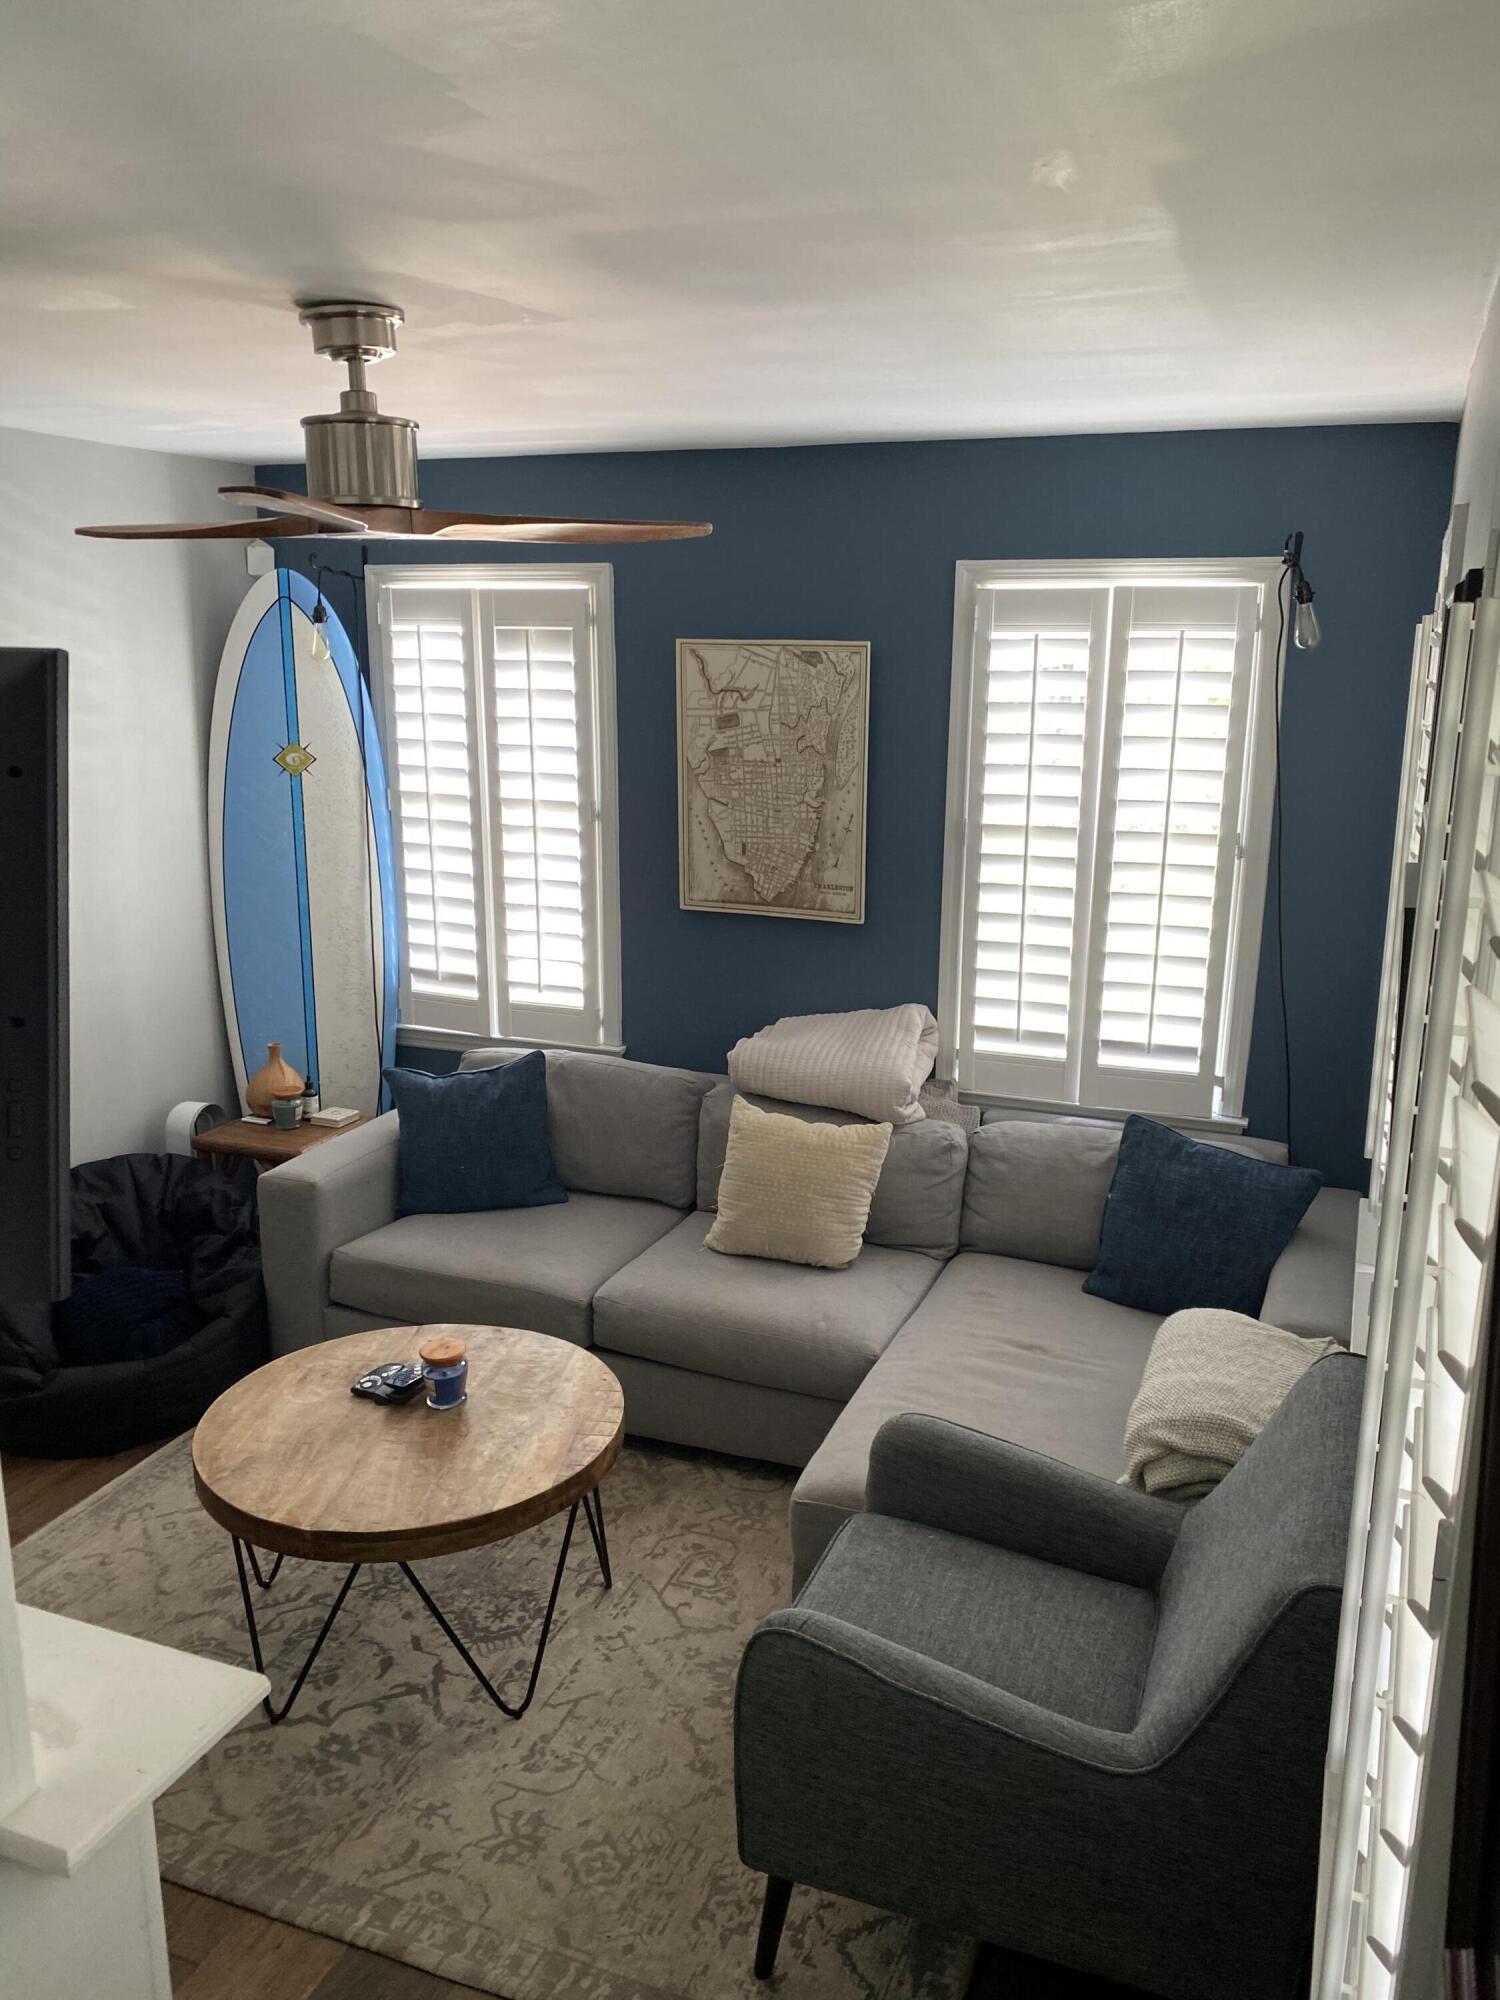 Radcliffeborough Homes For Sale - 1 Desportes, Charleston, SC - 3